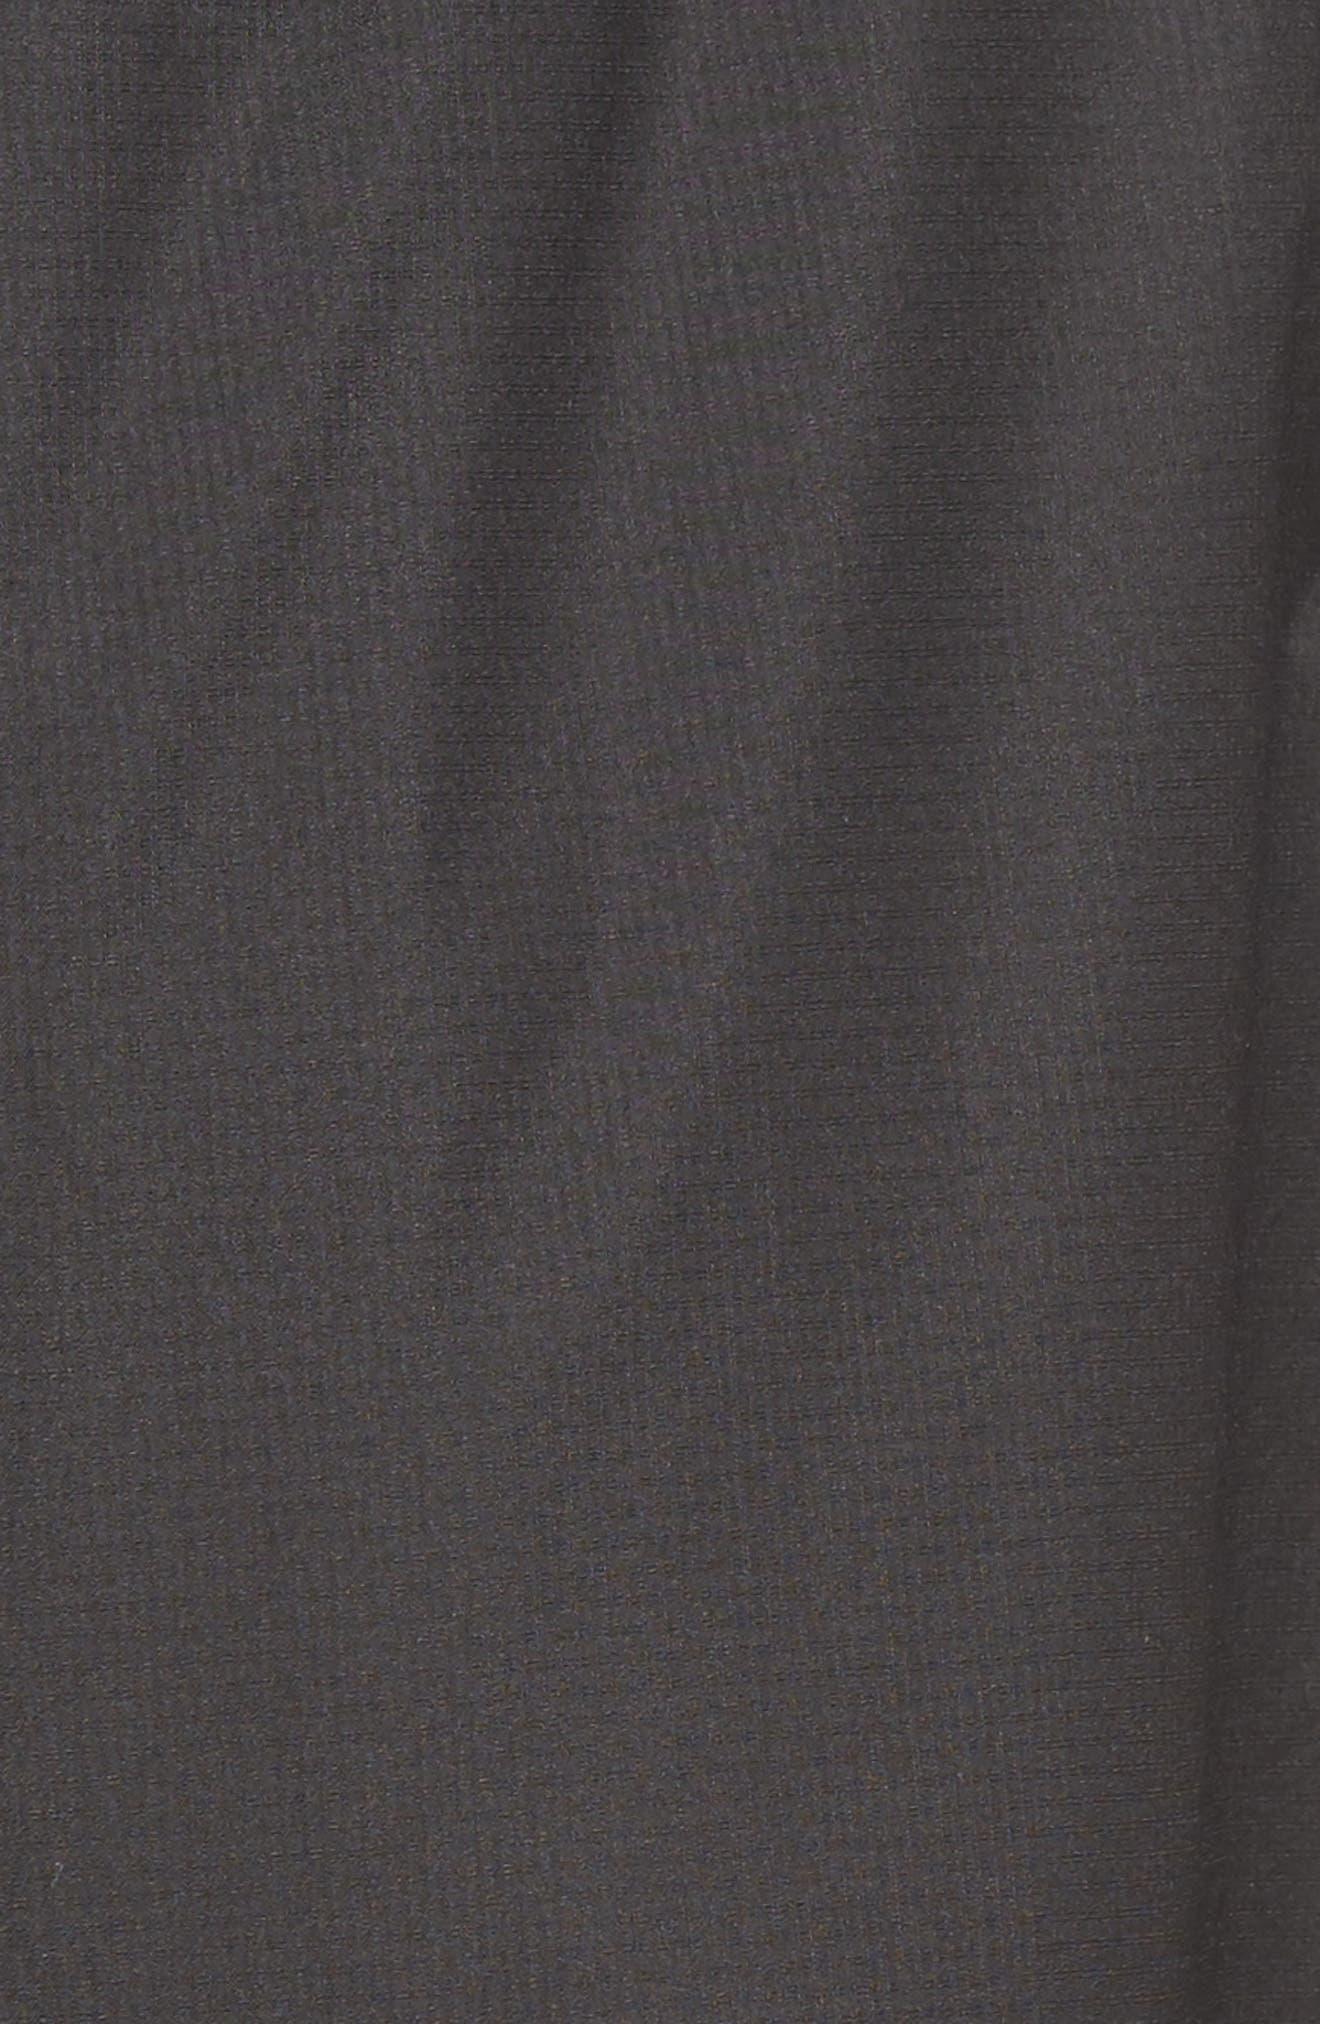 Venture Waterproof Pants,                             Alternate thumbnail 5, color,                             001